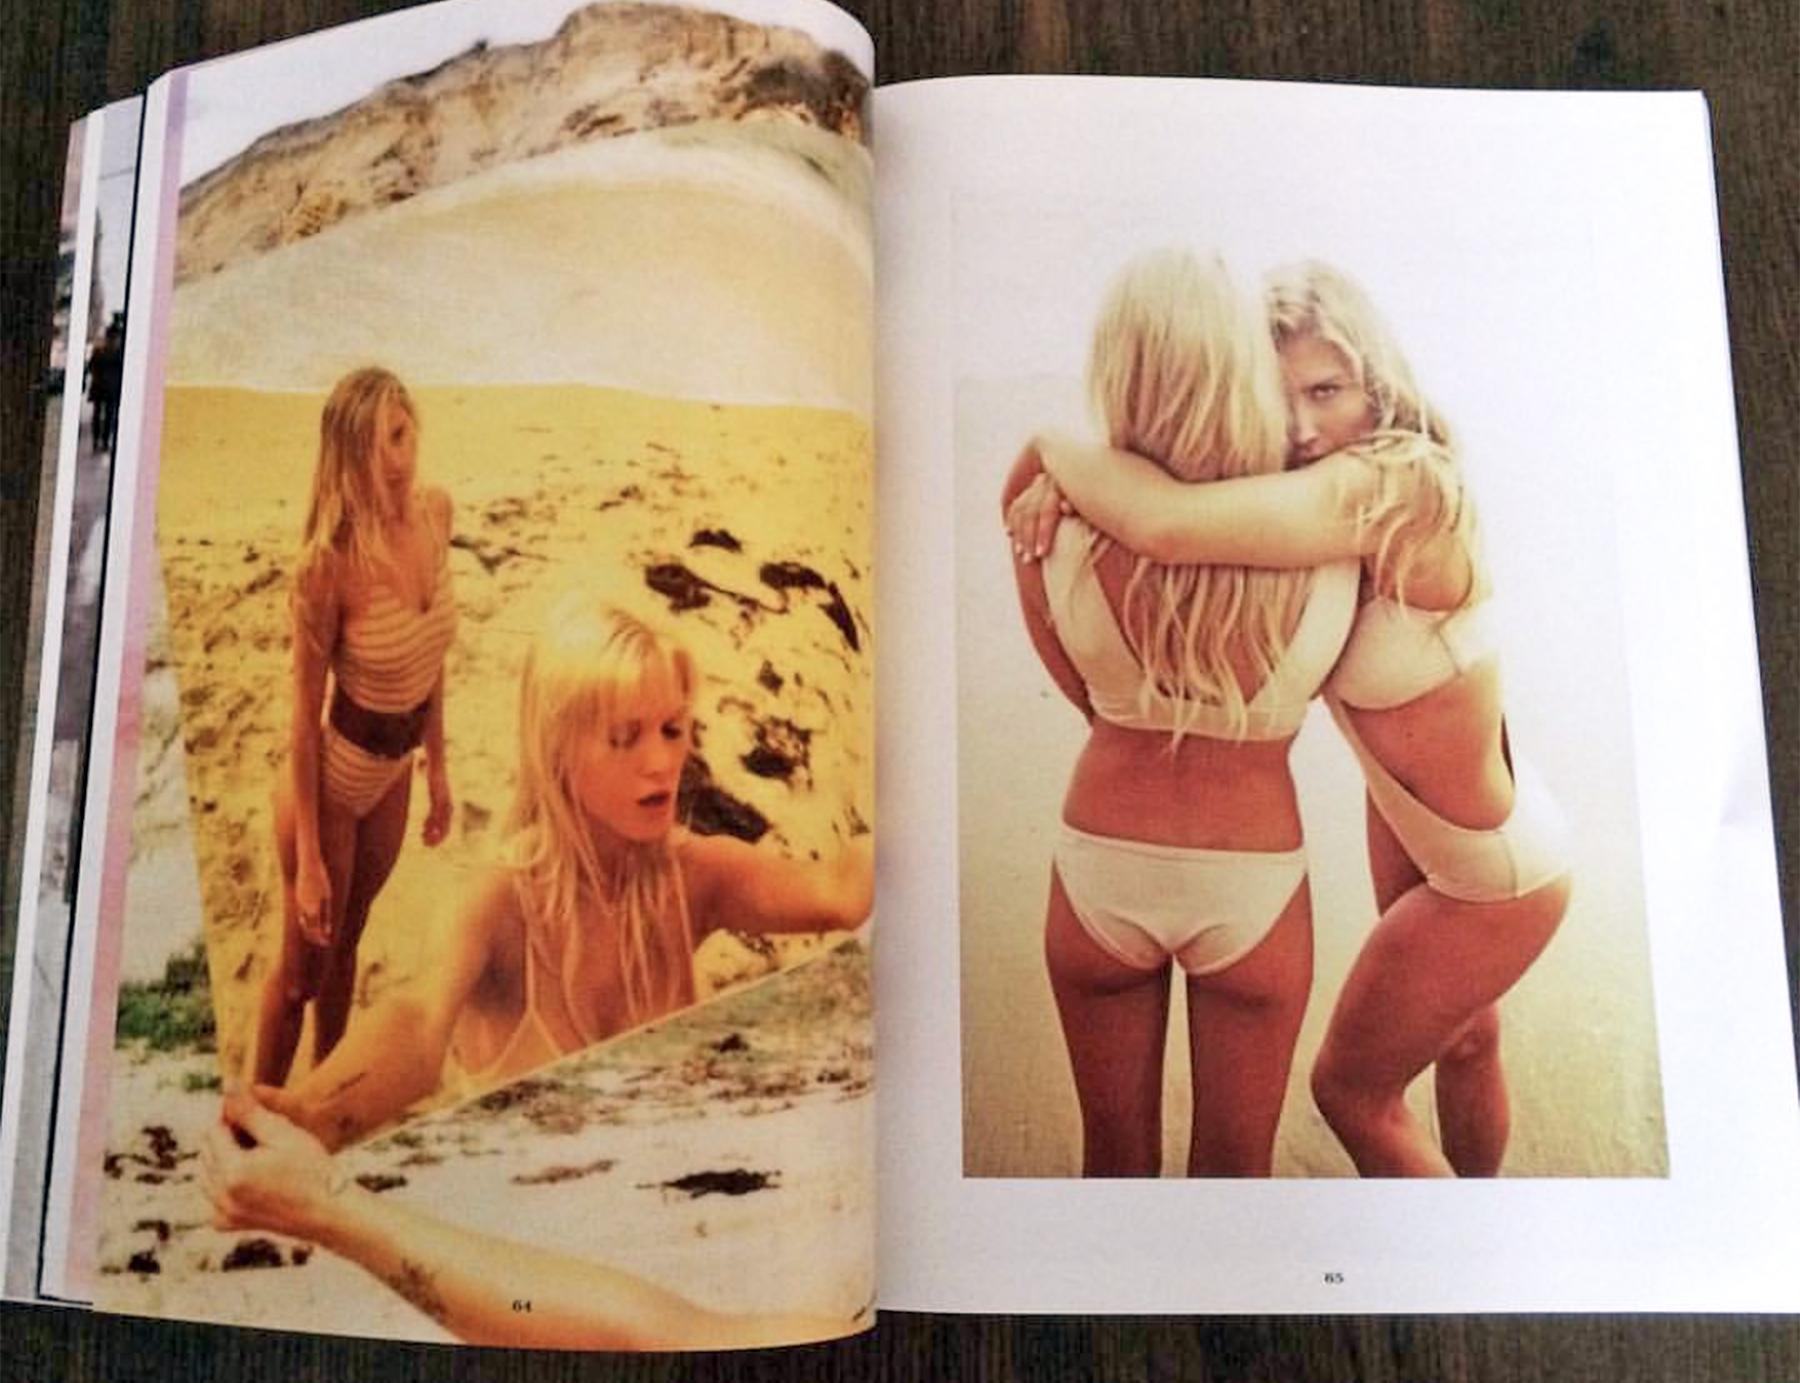 Acute Magazine